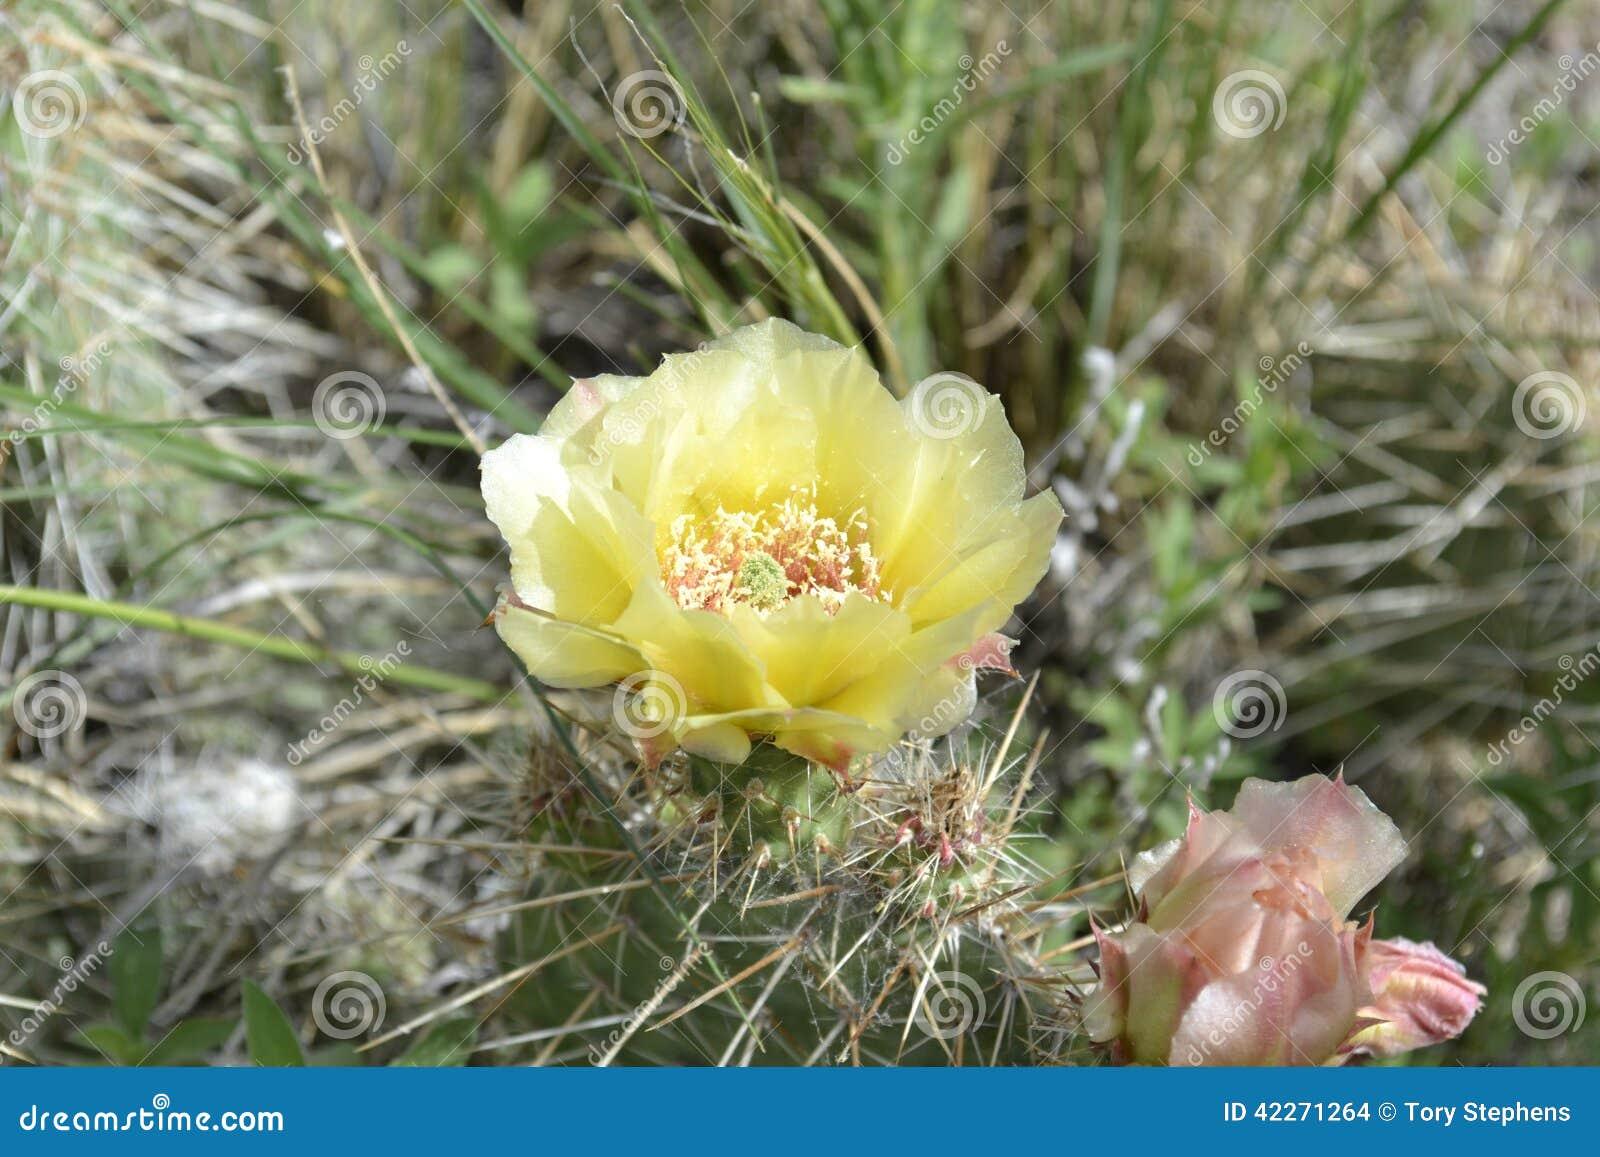 Prickely Pear Cactus in bloom